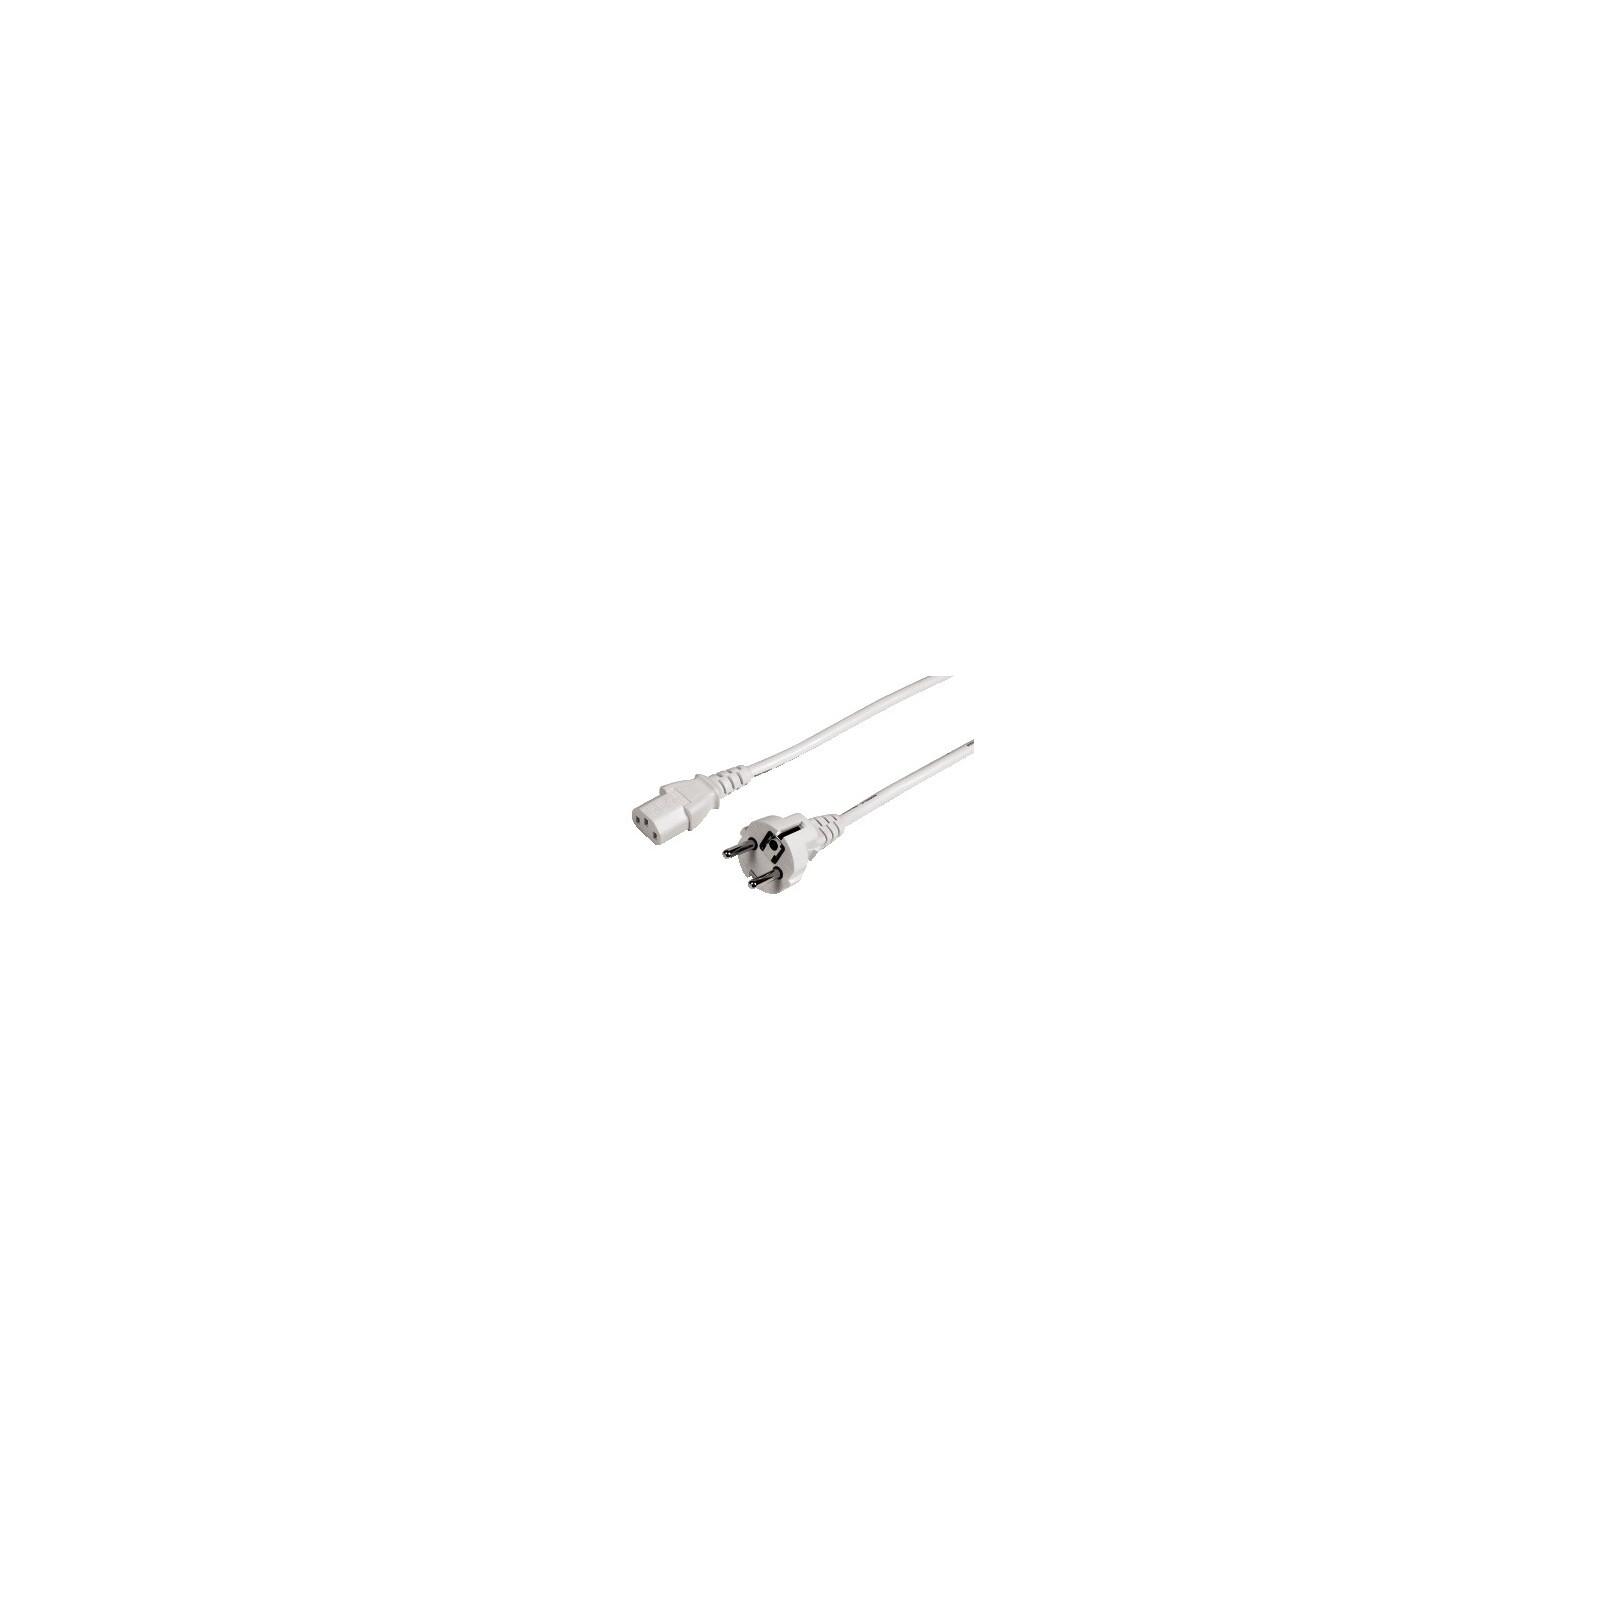 Hama 44242 Kaltgeräte-Zuleitung, 5 m, Weiß